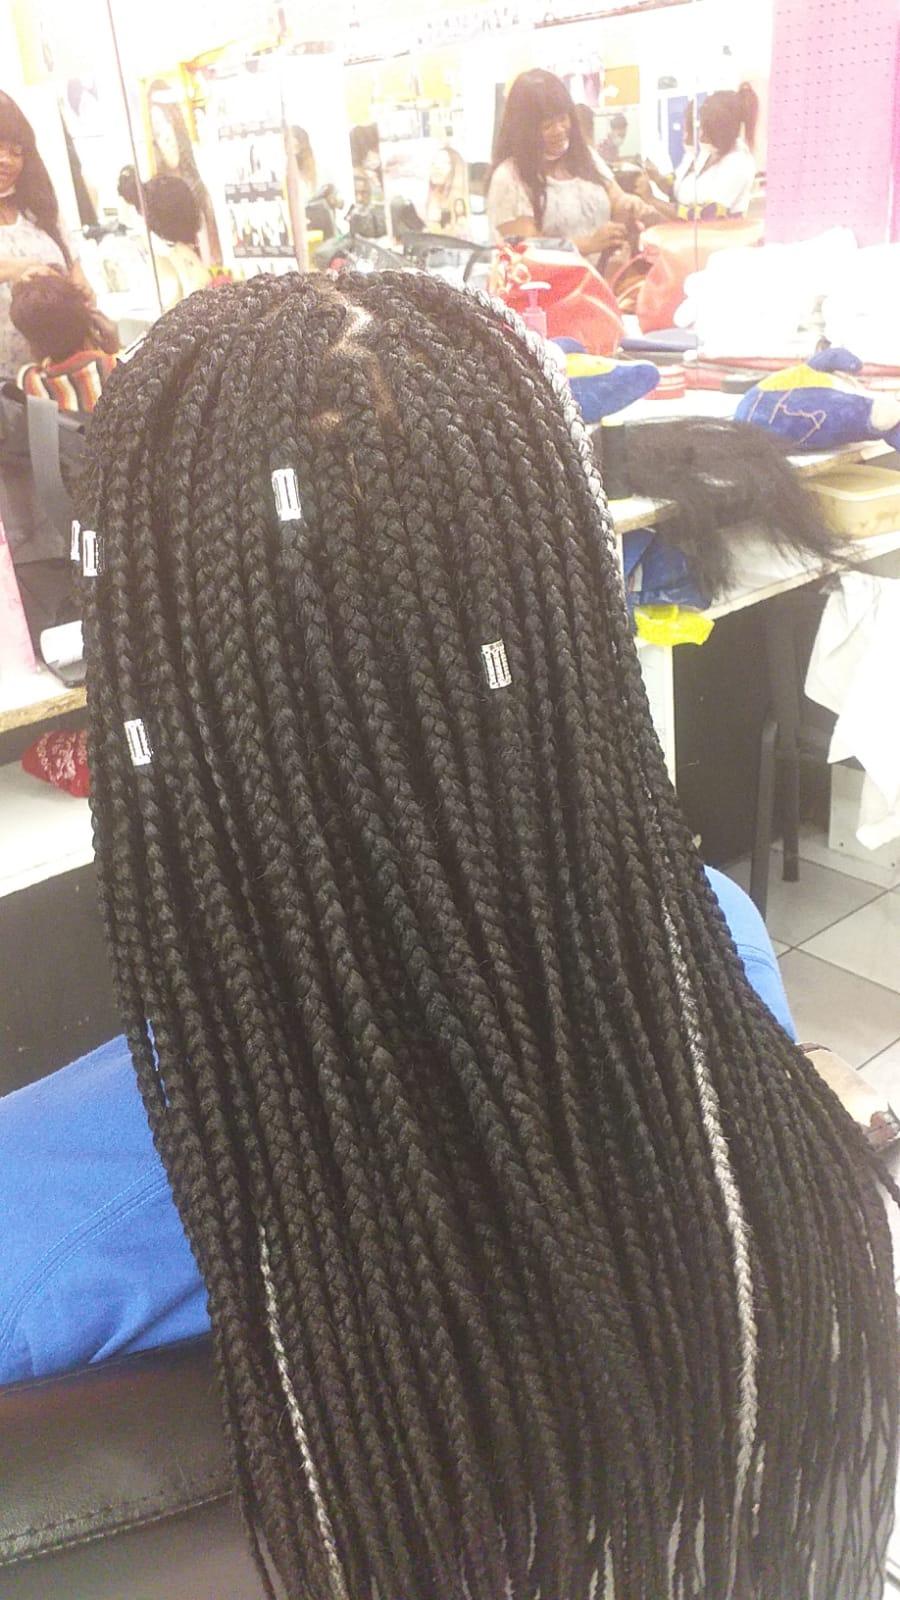 salon de coiffure afro tresse tresses box braids crochet braids vanilles tissages paris 75 77 78 91 92 93 94 95 TOJJLBSN